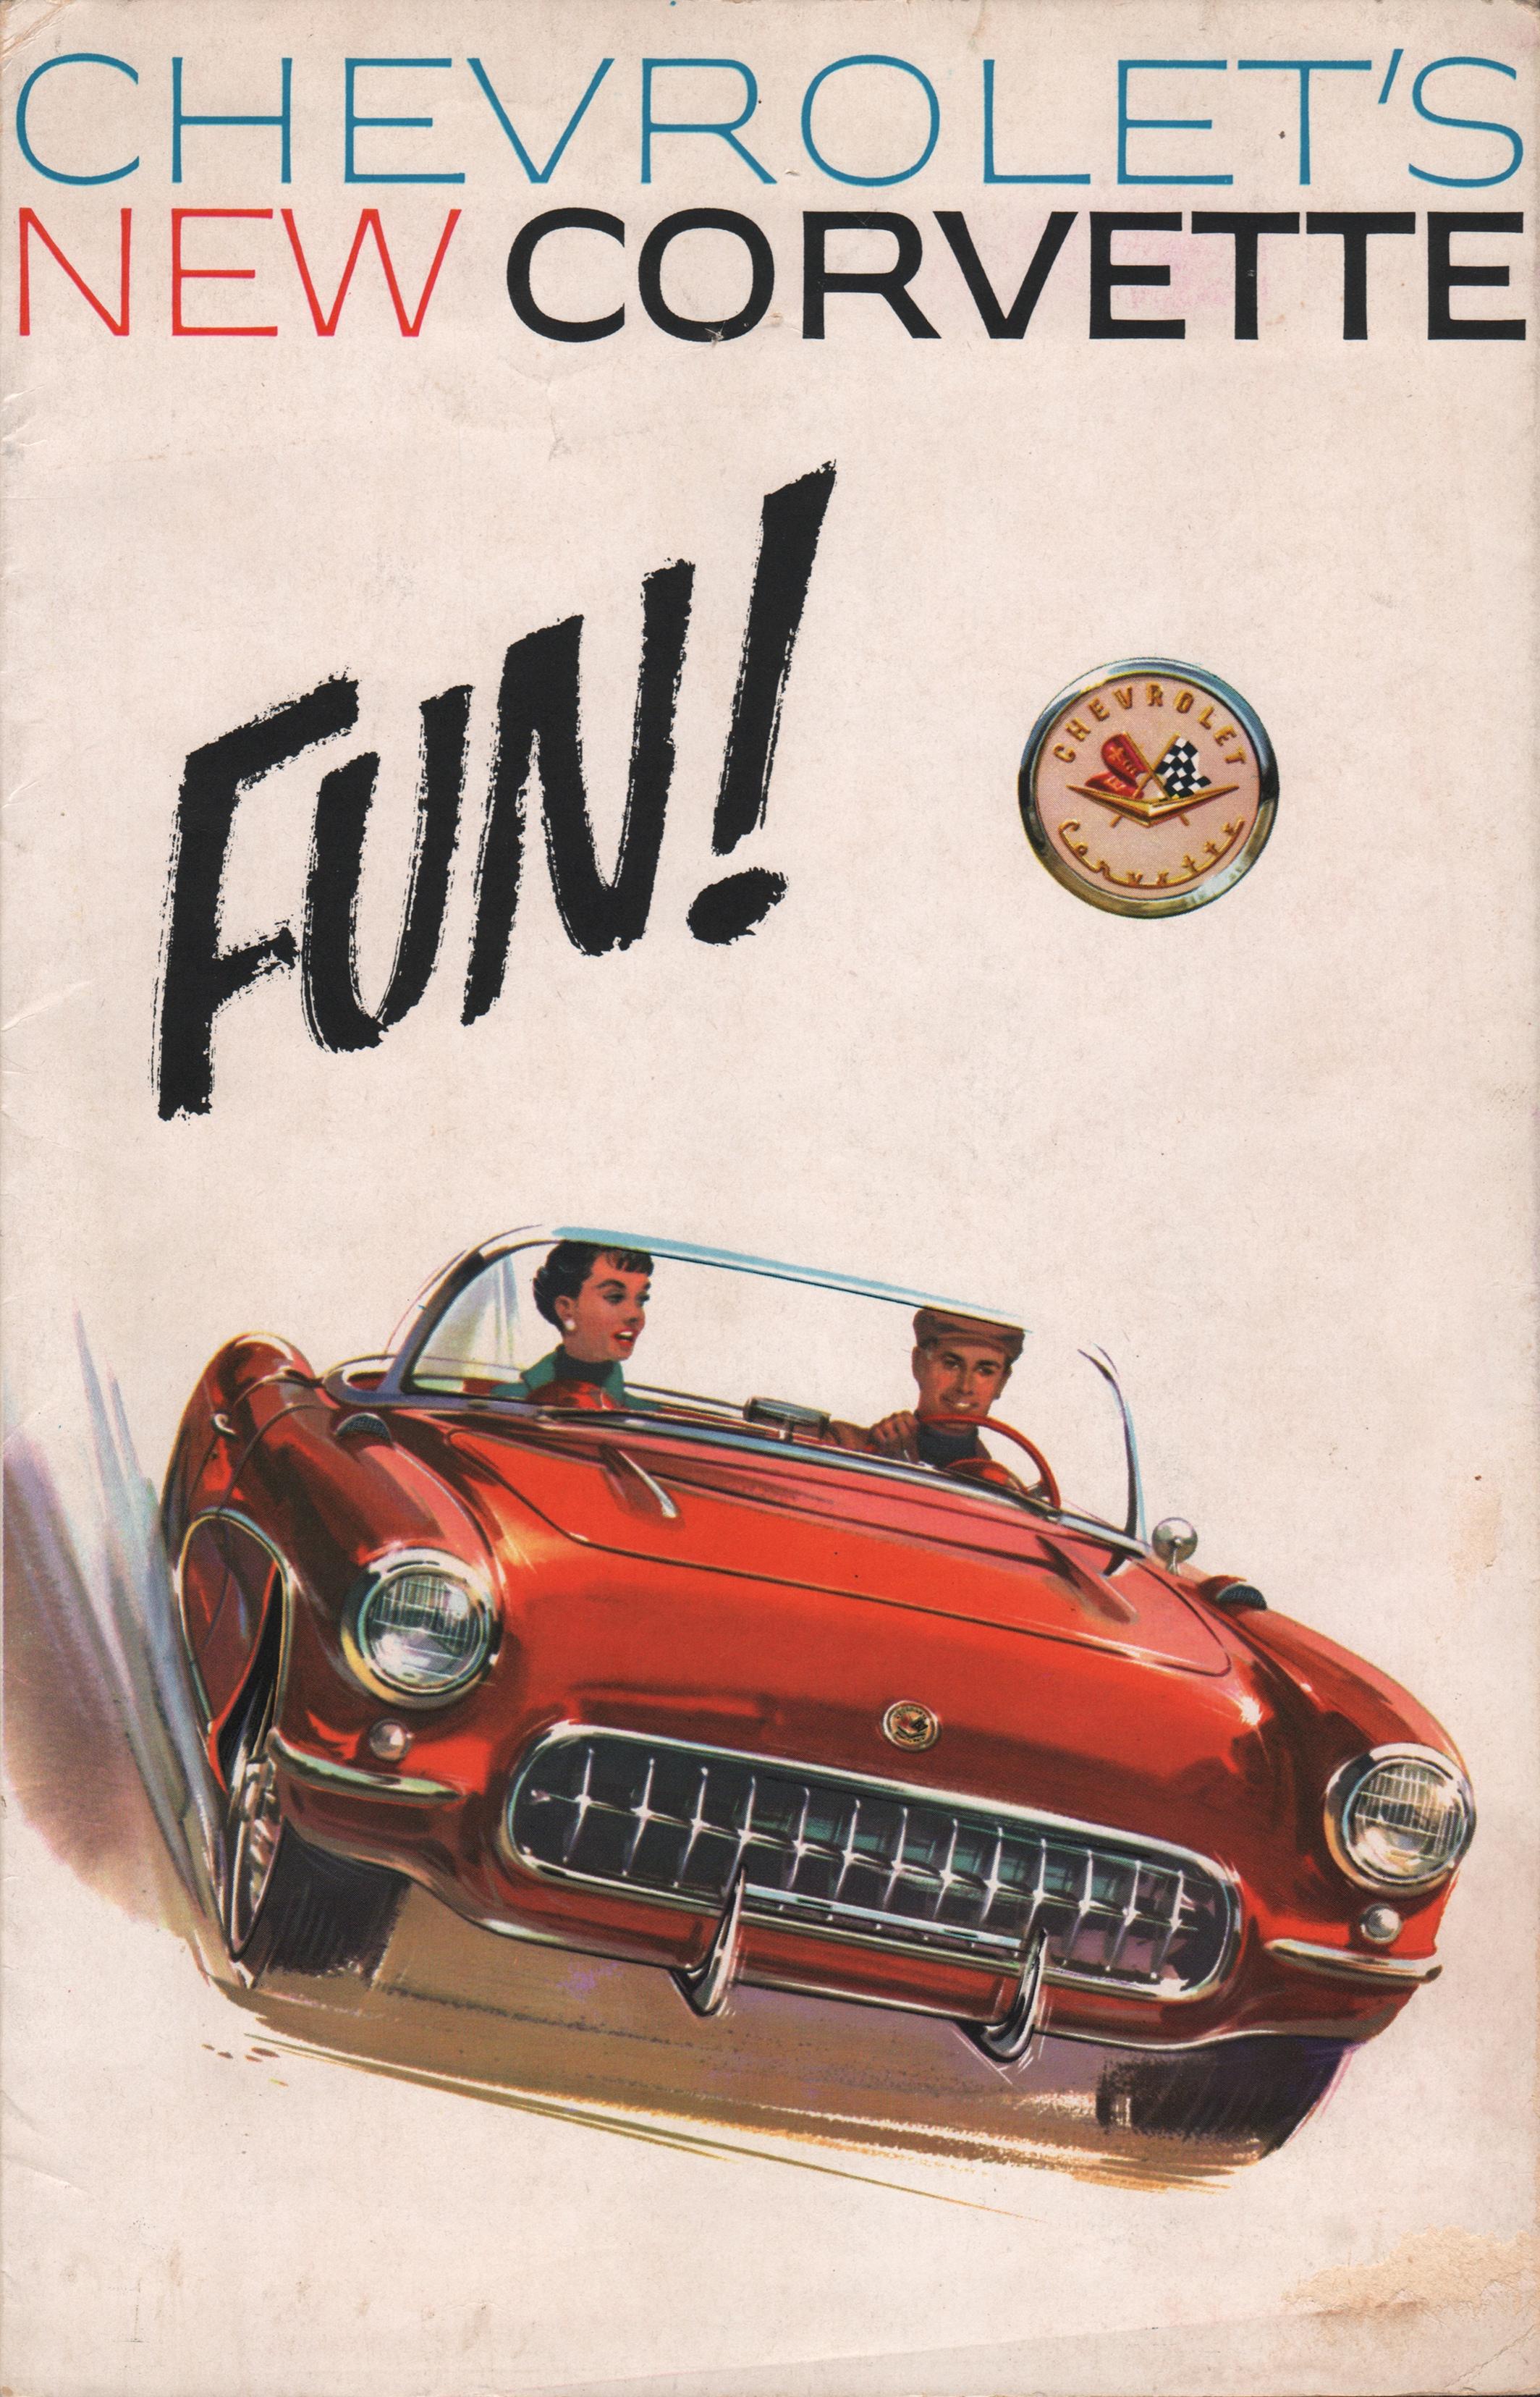 GM 1957 Chevrolet Corvette Sales Brochure